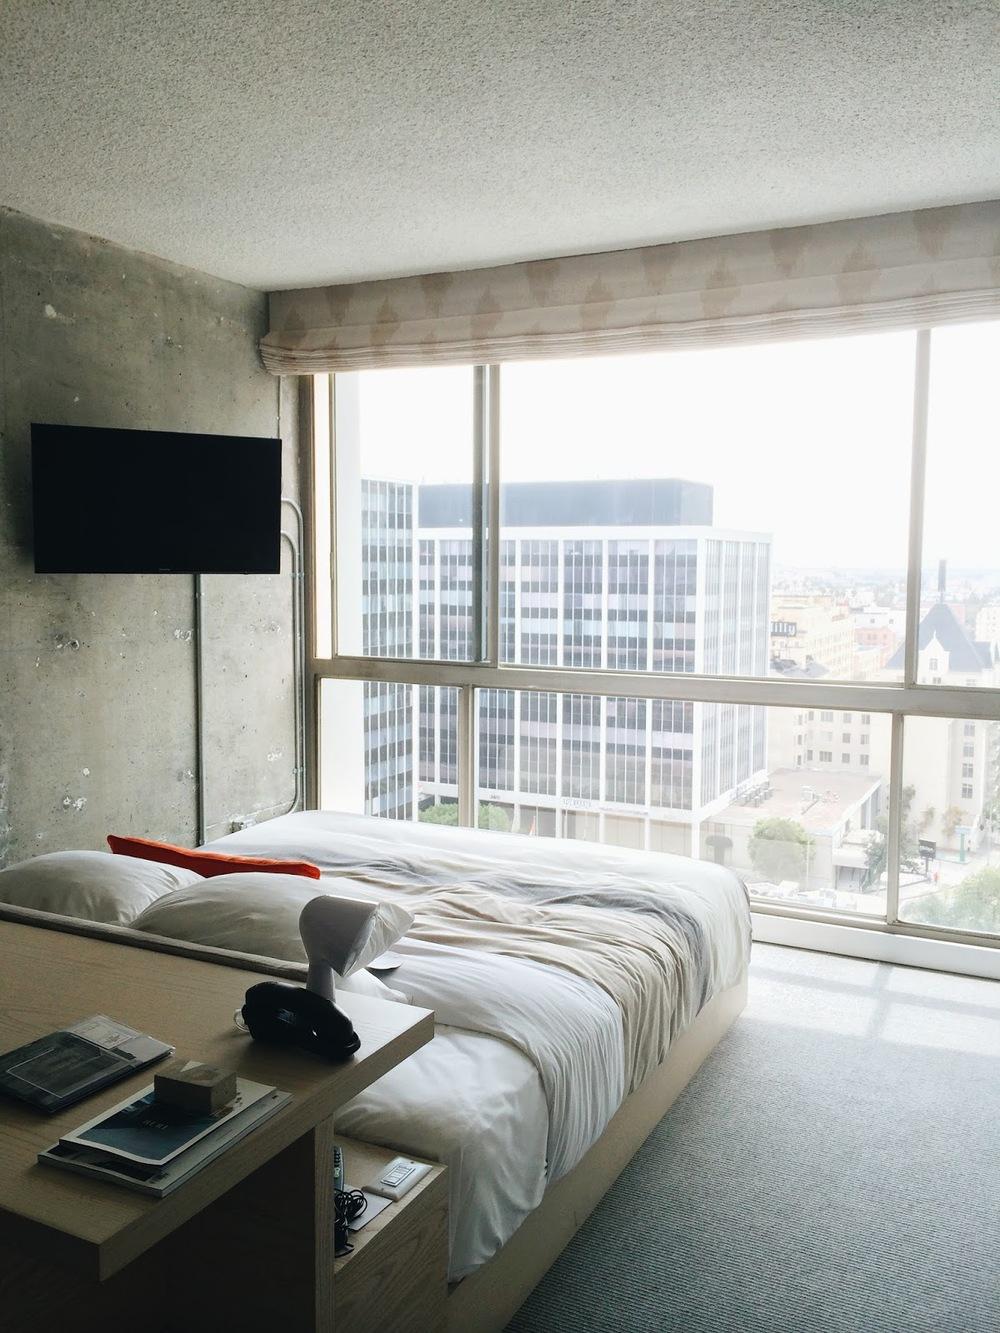 mybelonging-hoteltonight-htinsider-thelinehotel-losangeles-koreatown.JPG